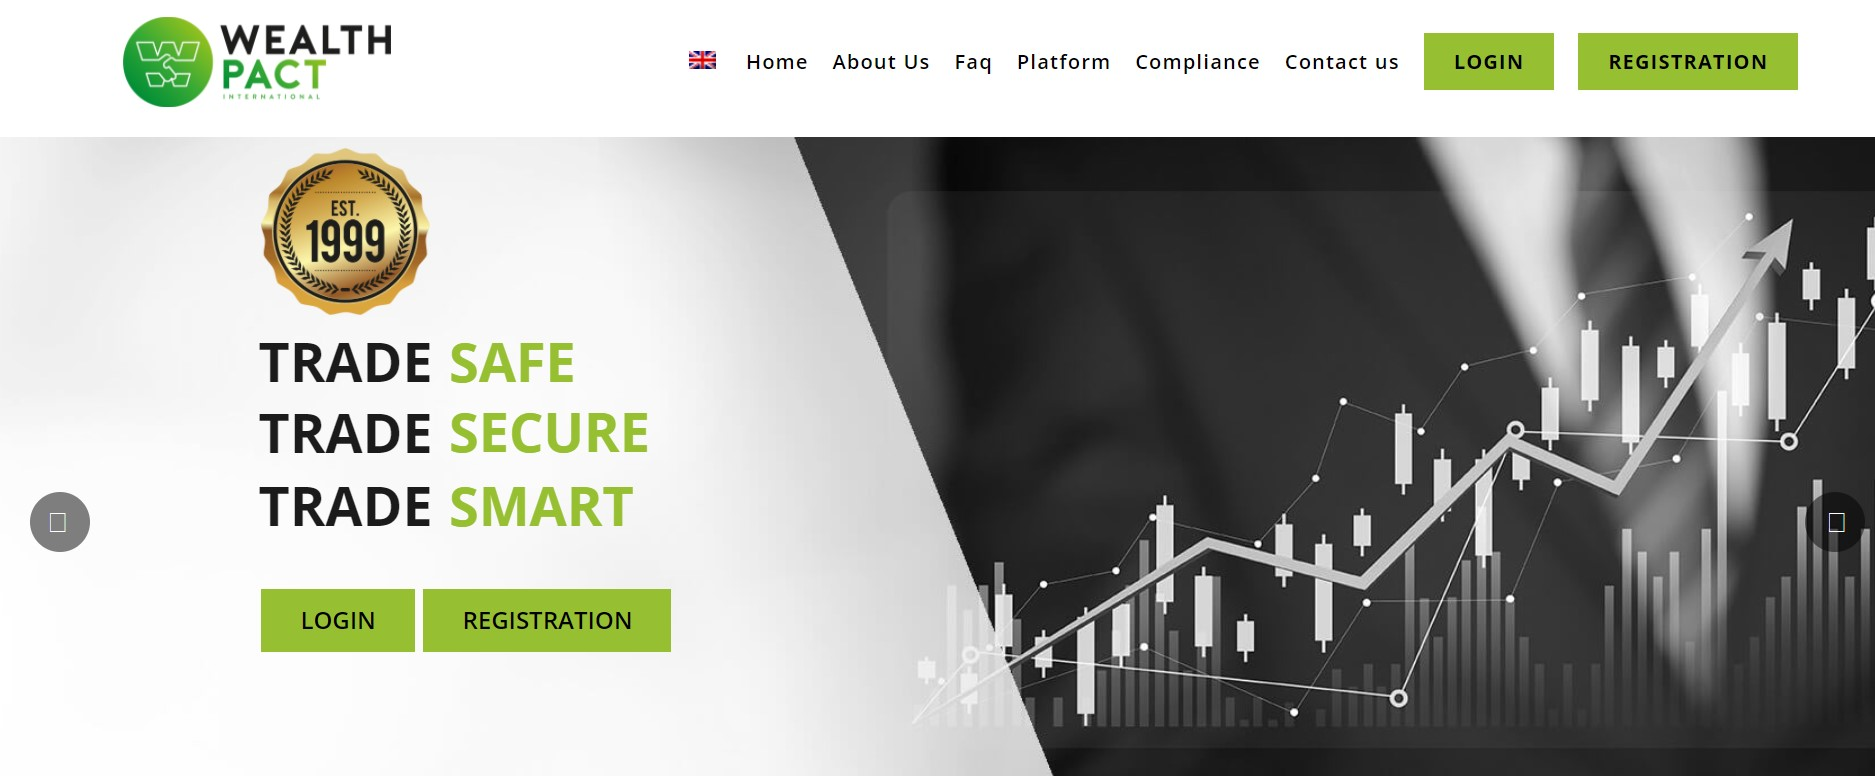 Wealth Pact website